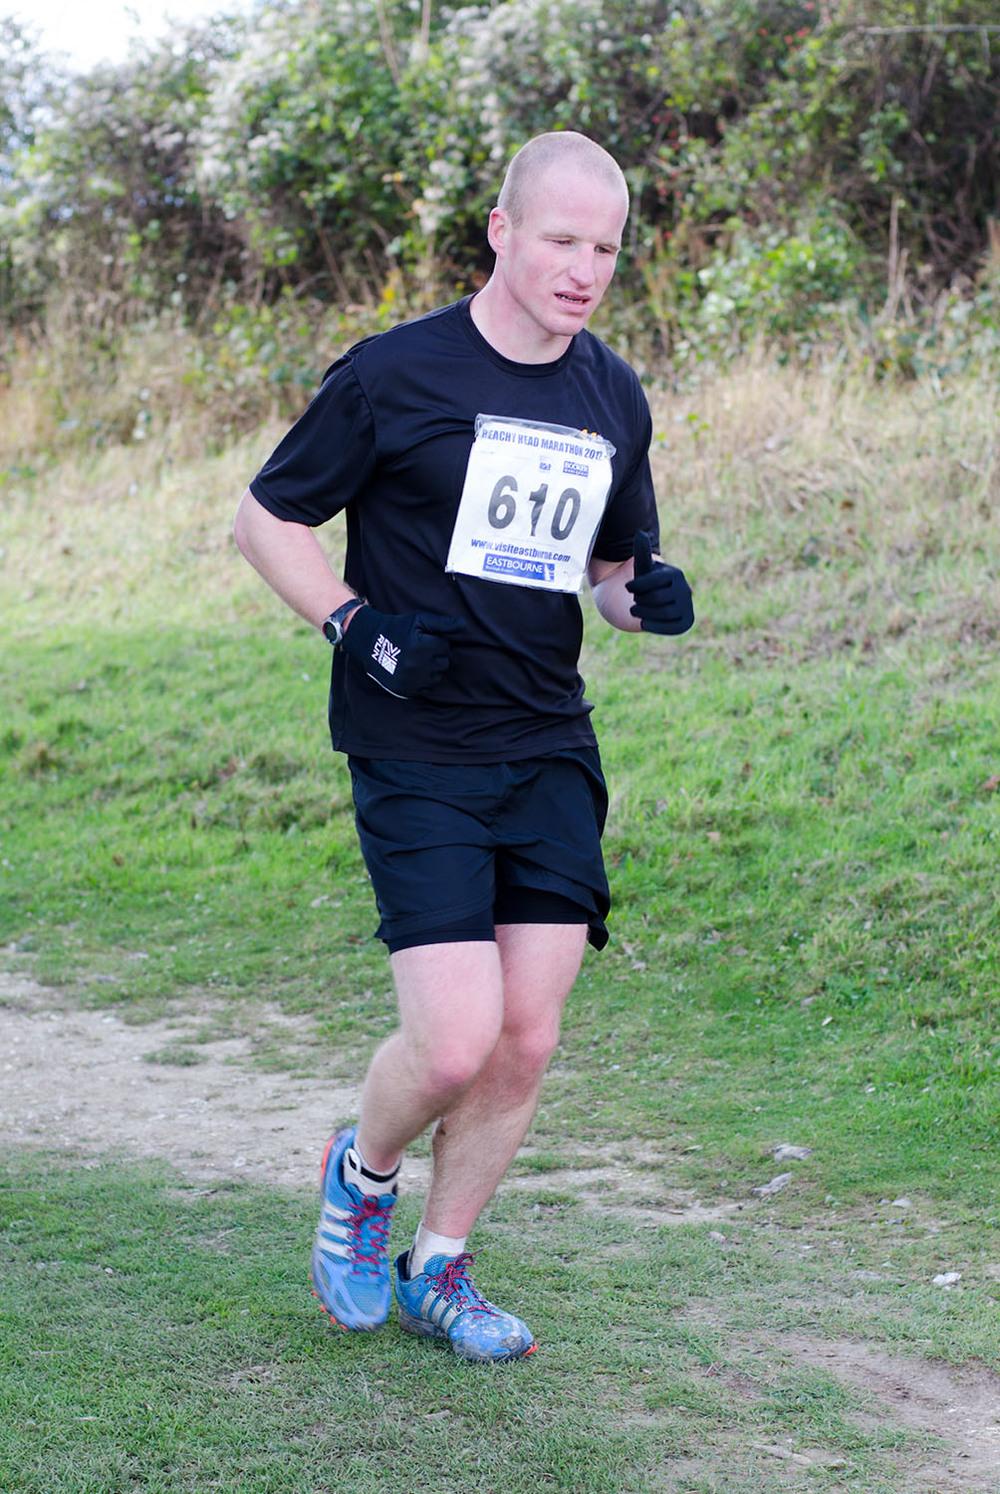 Beachy Head Marathon 2012 - Mile 25